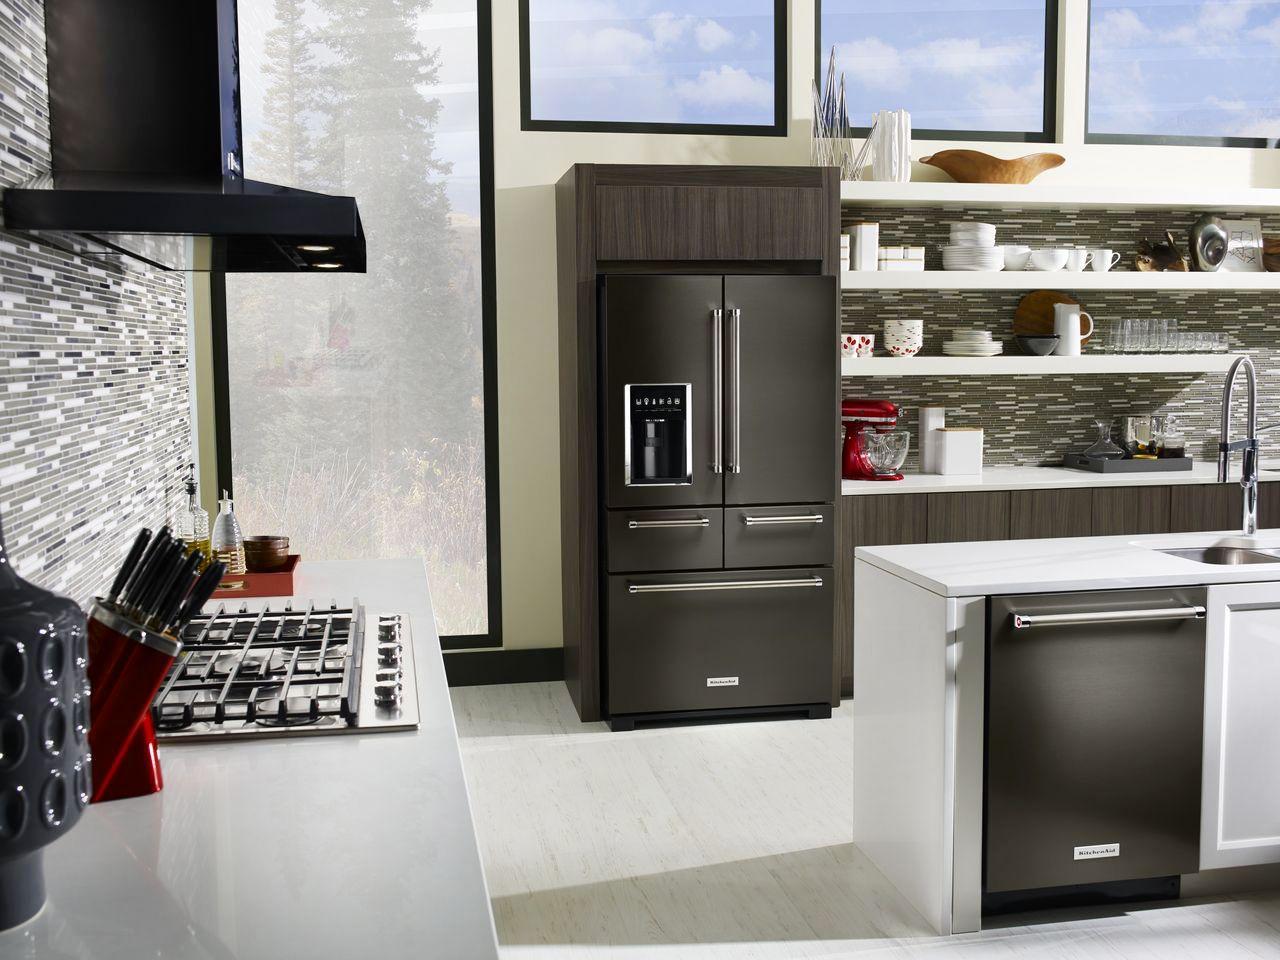 Kitchenaid Black Stainless Kitchen Appliances Chefs Cooks